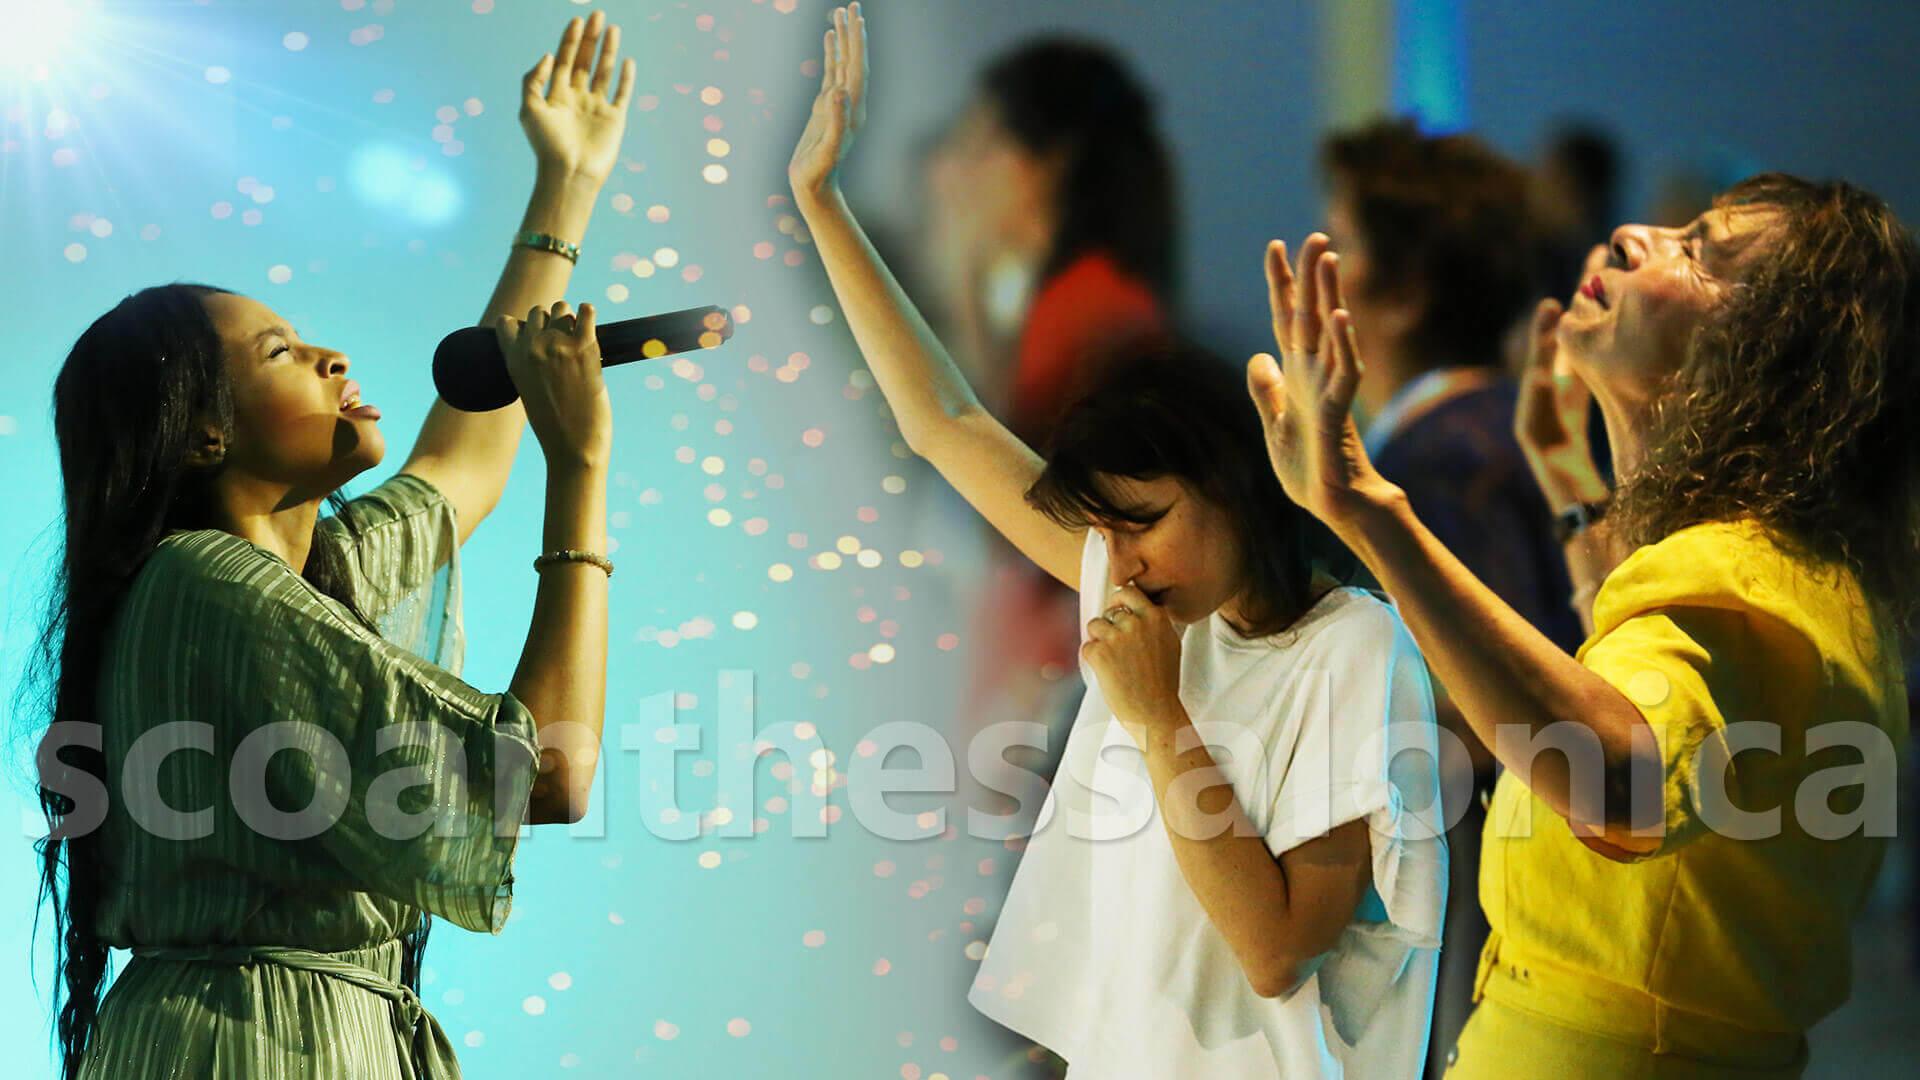 SCOAN_THESSALONICA_WORSHIP_2020_06_21